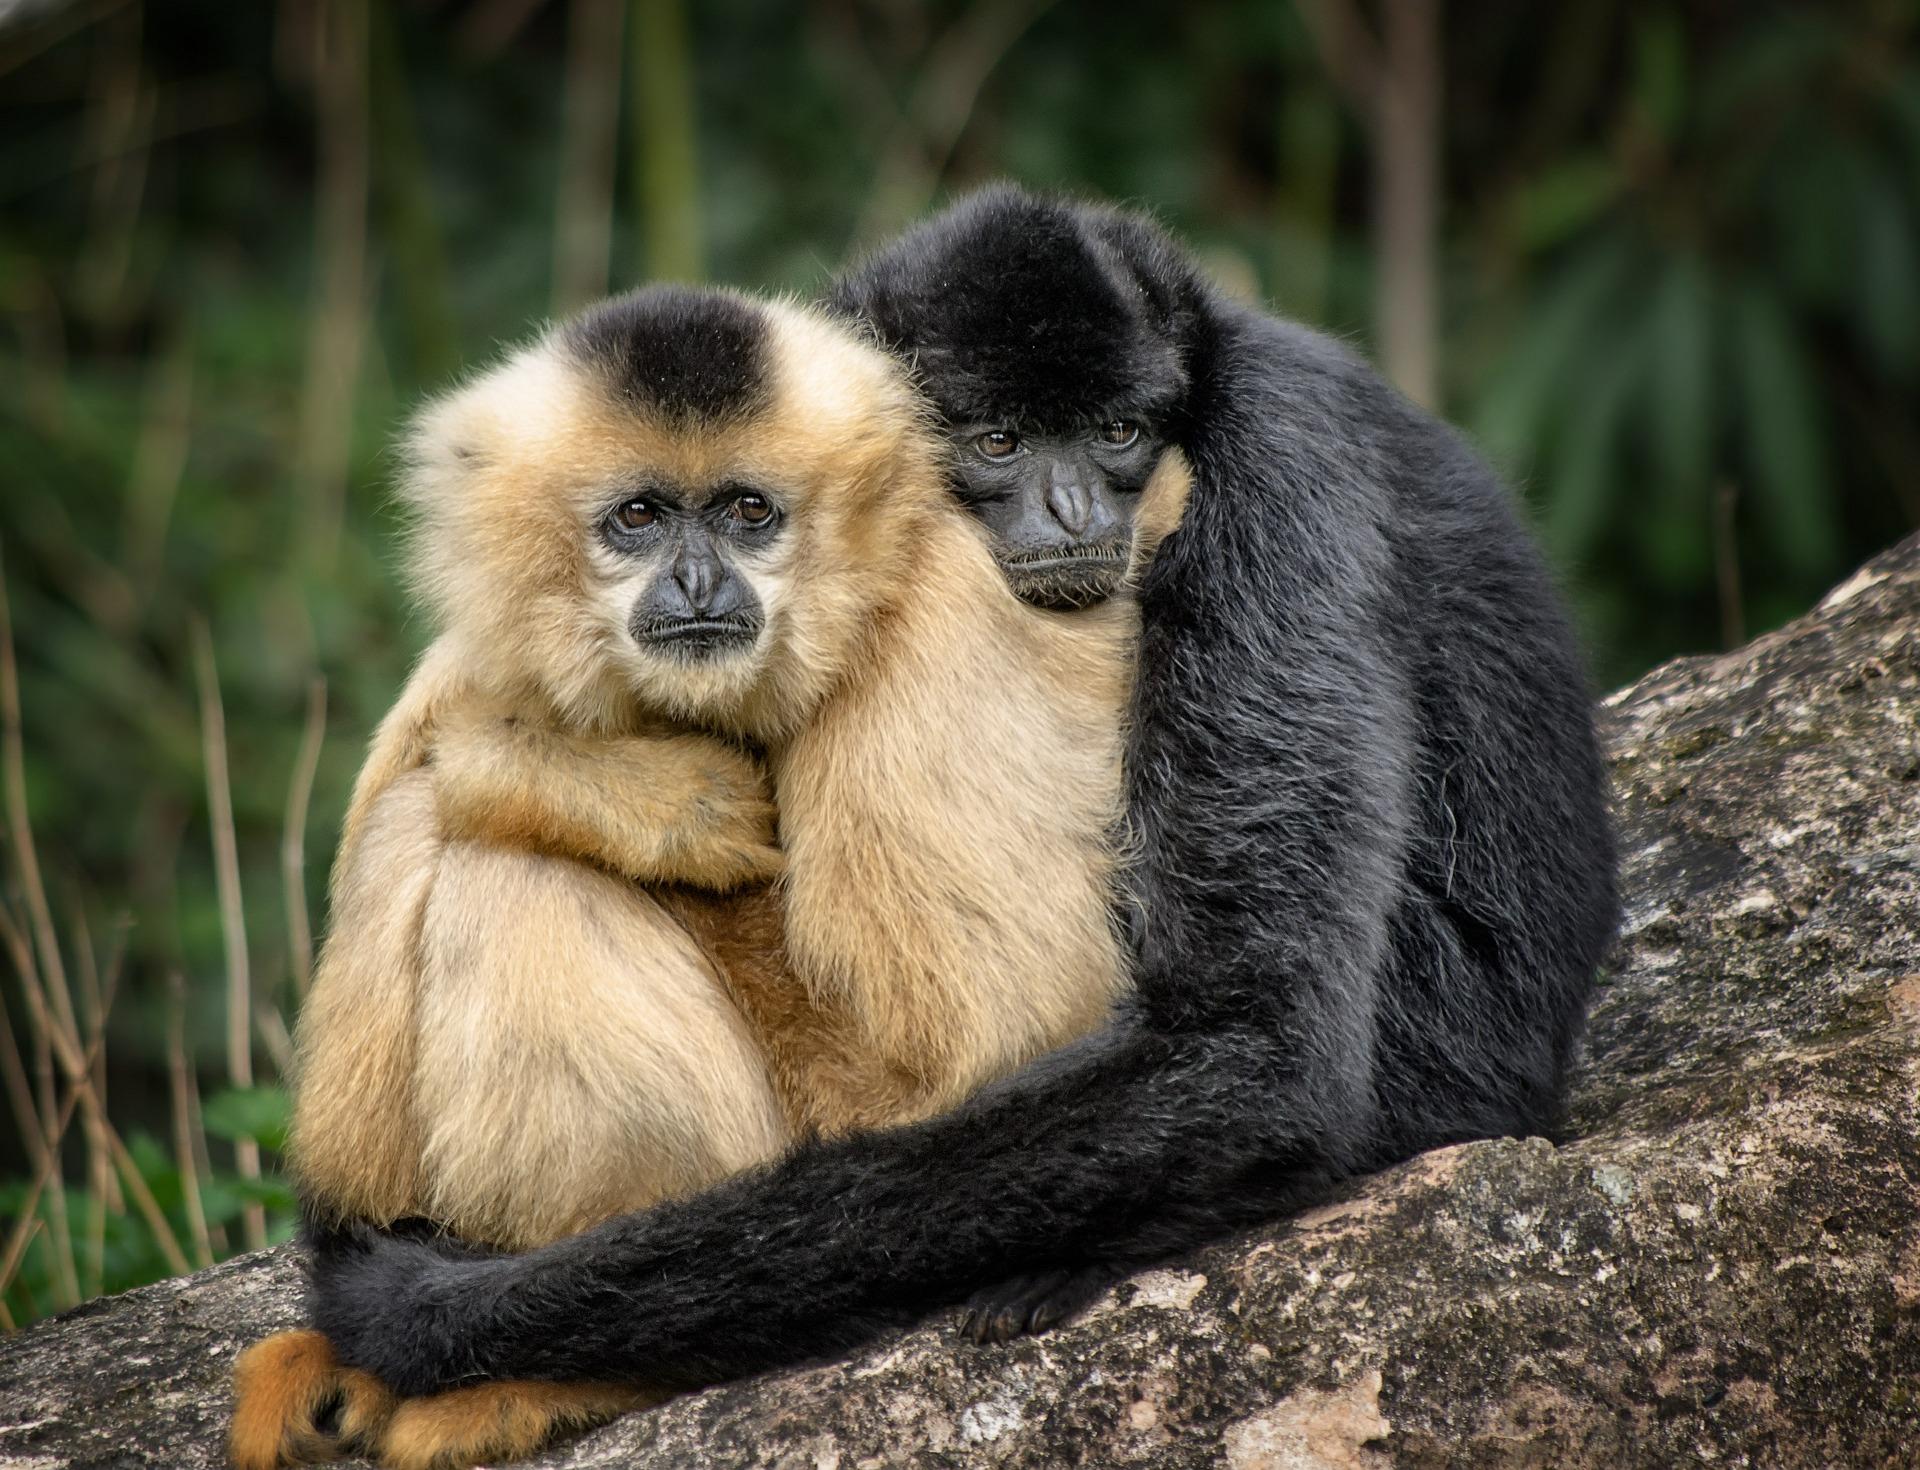 Two monkeys hugging